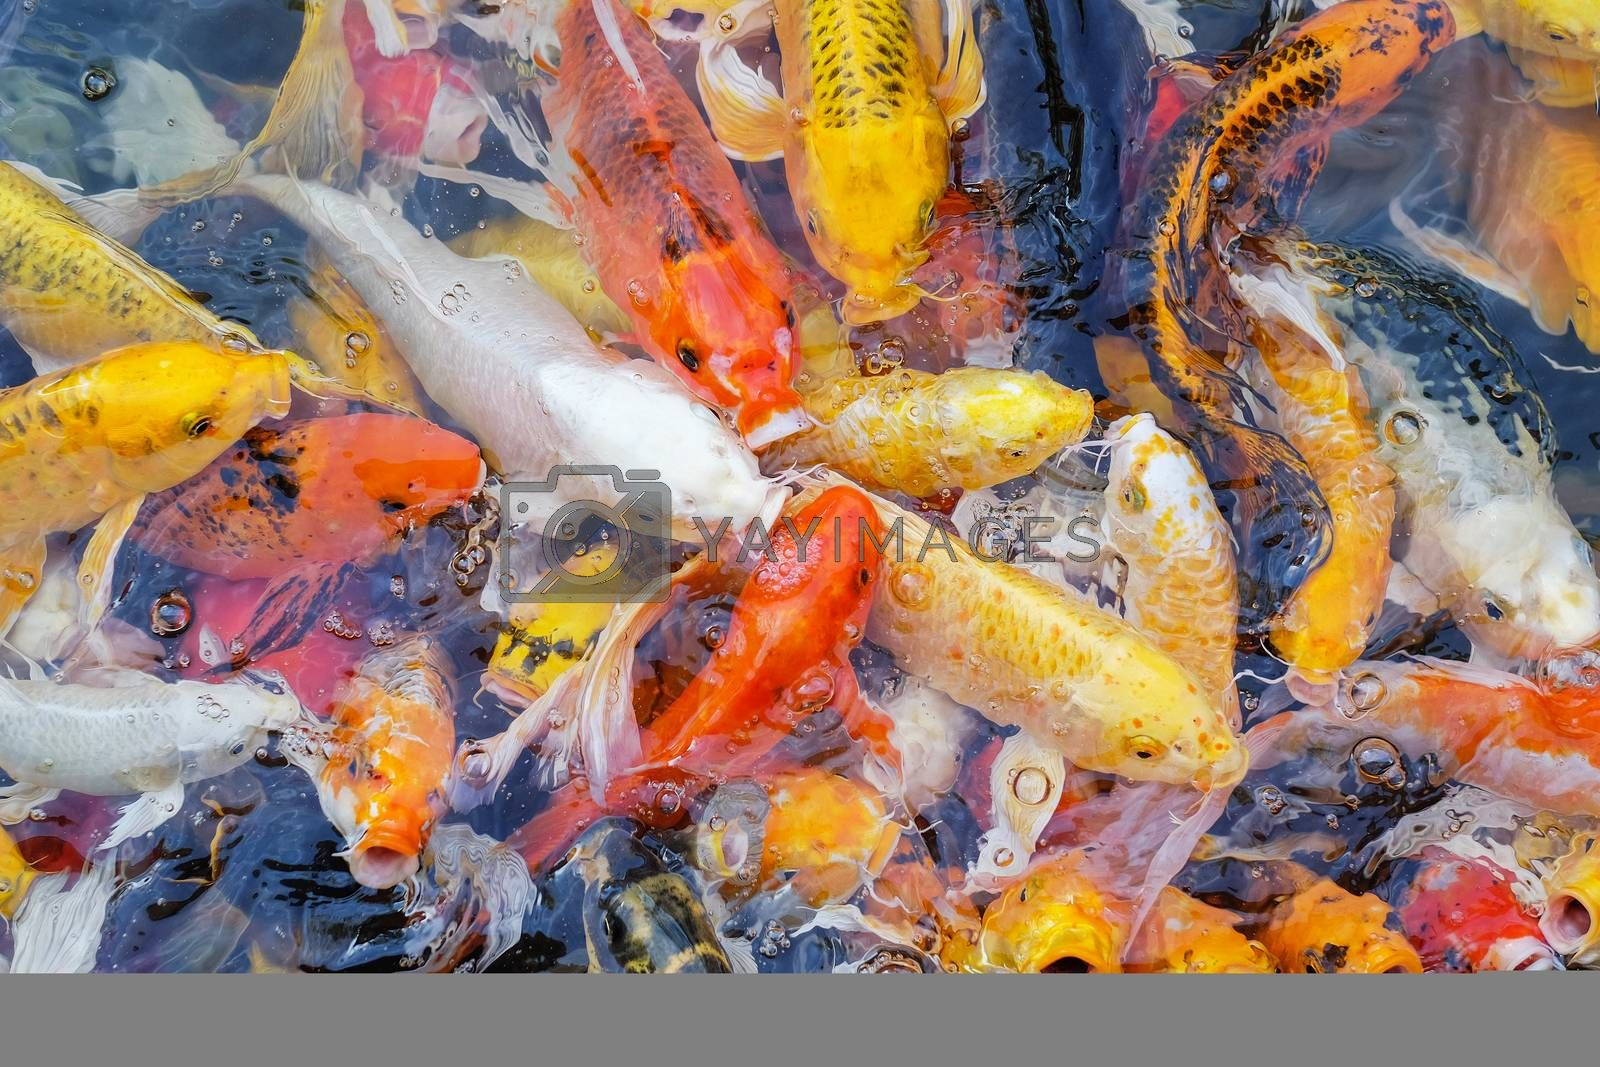 Colorful fancy carp fish, koi fish by Surasak